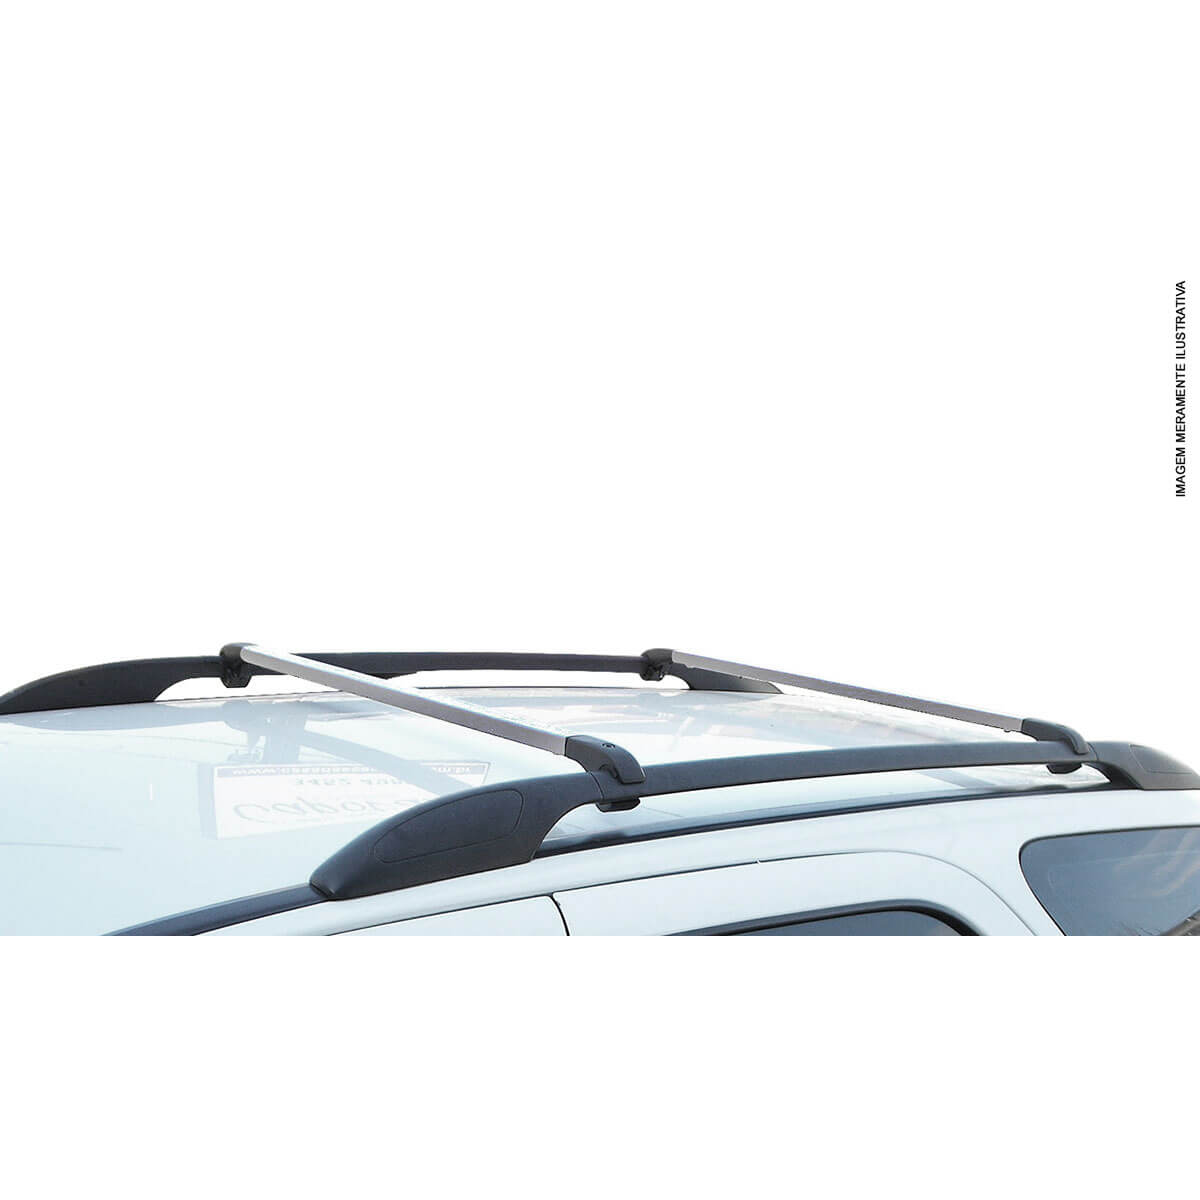 Travessa rack de teto alumínio Peugeot 2008 2016 e 2017